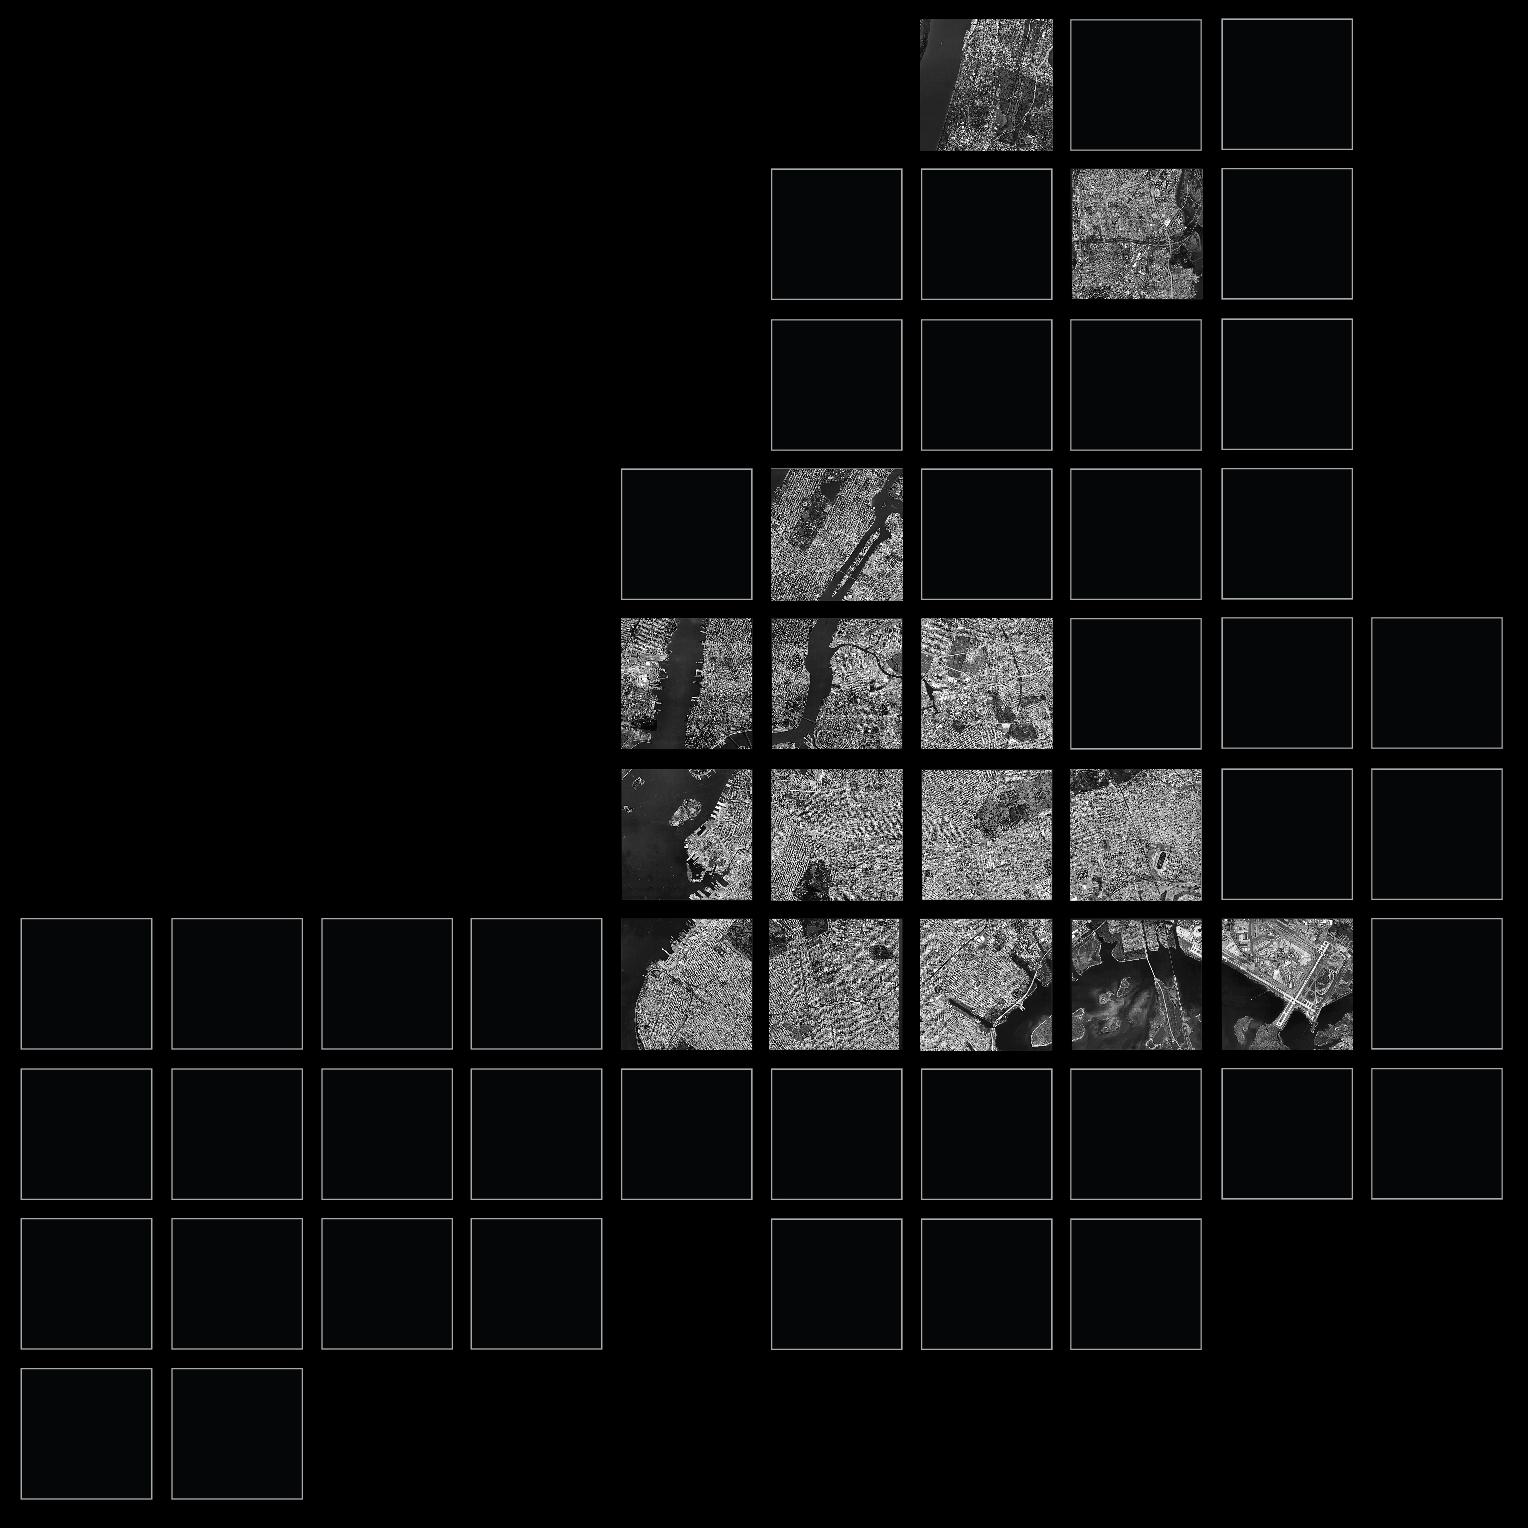 tracking-5_4-01 copy.jpg